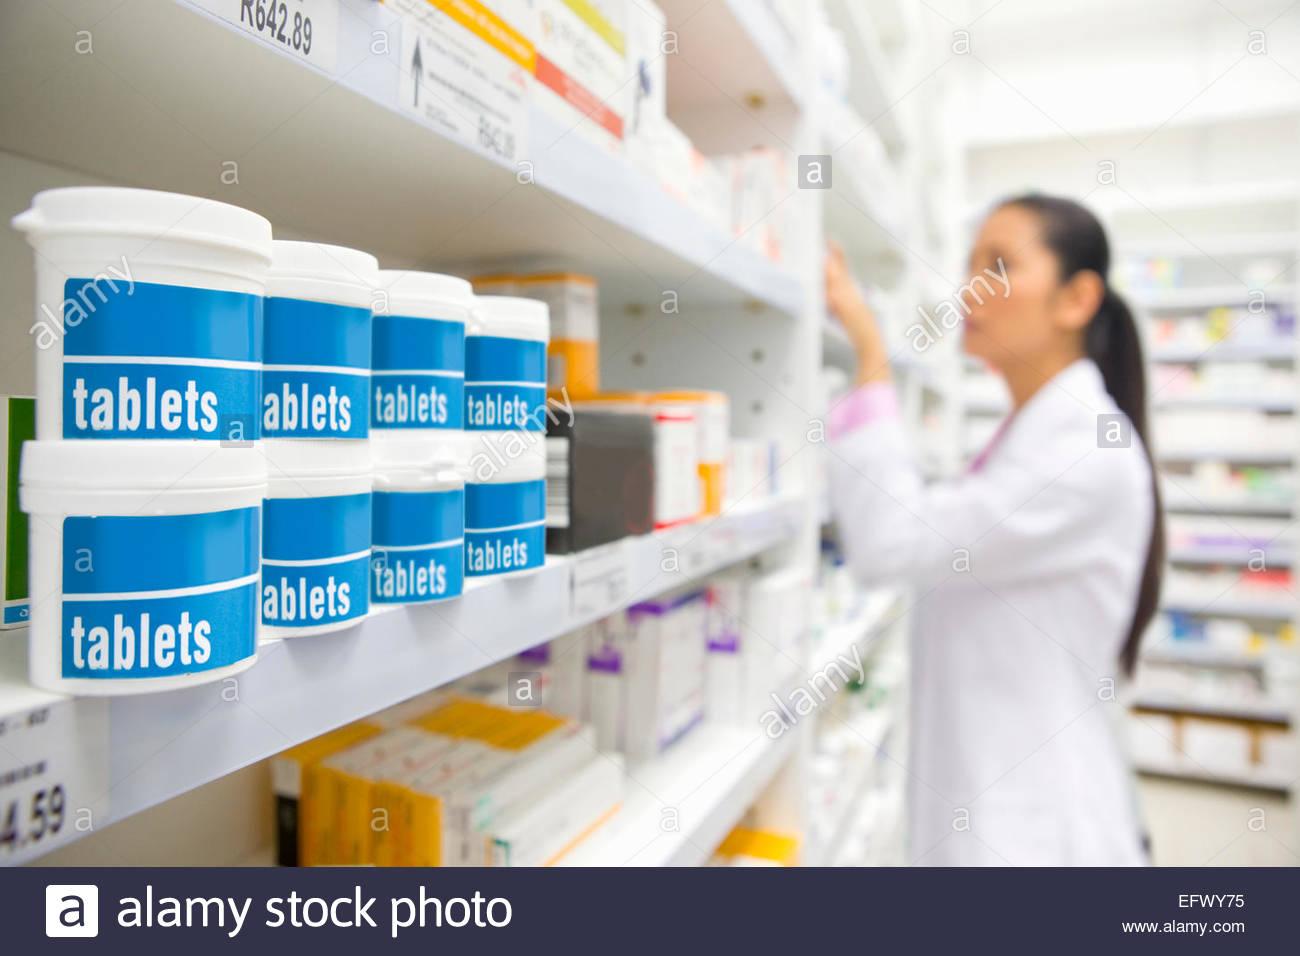 Pharmacist looking for medication on pharmacy shelf - Stock Image